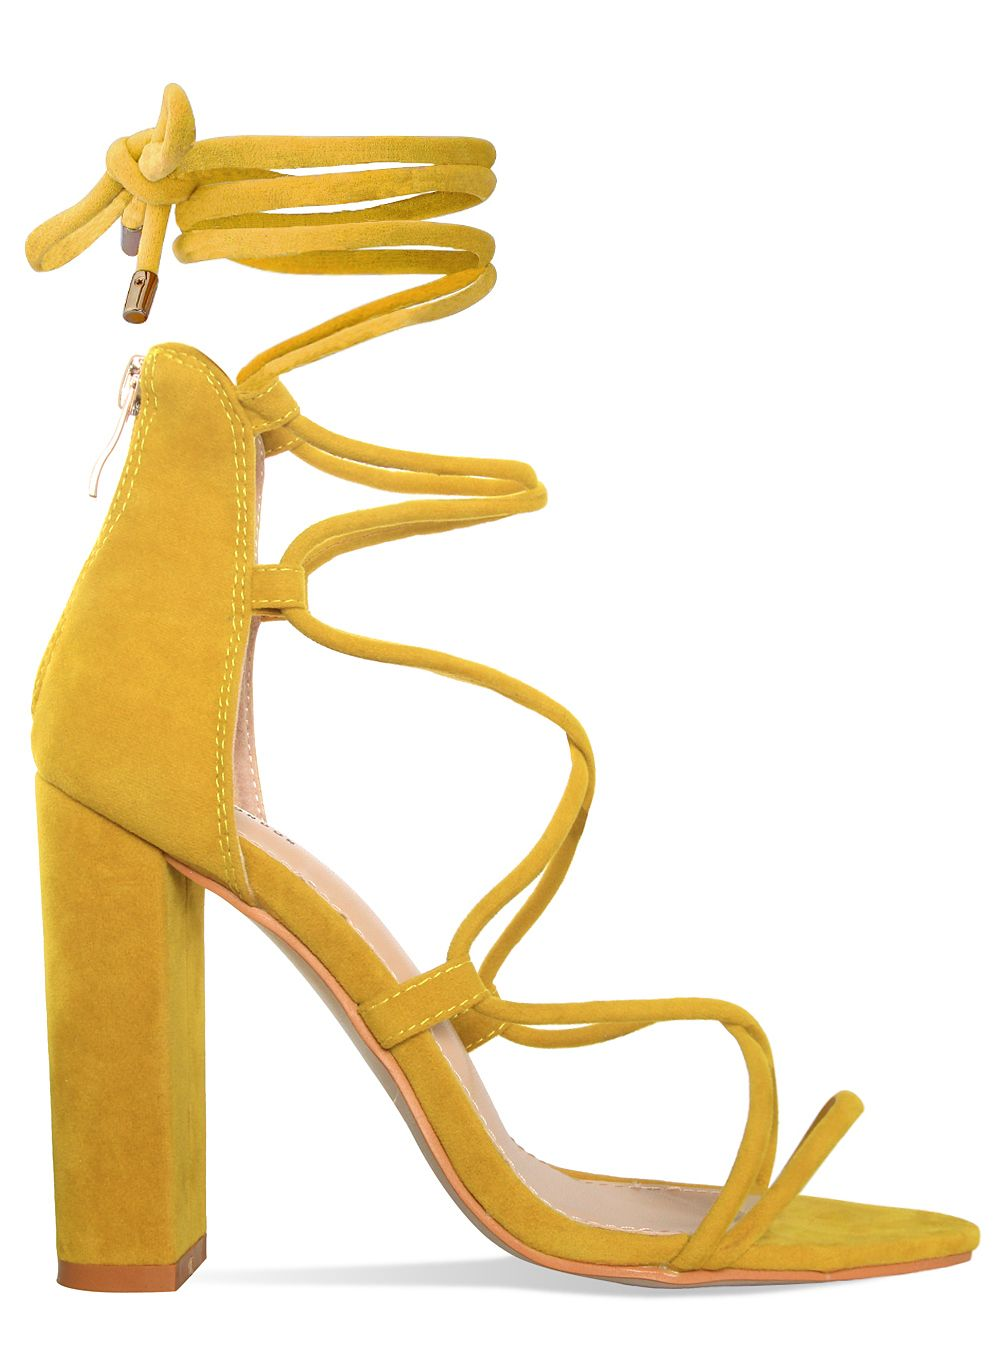 Hannah Mustard Suede Lace Up Block Heels